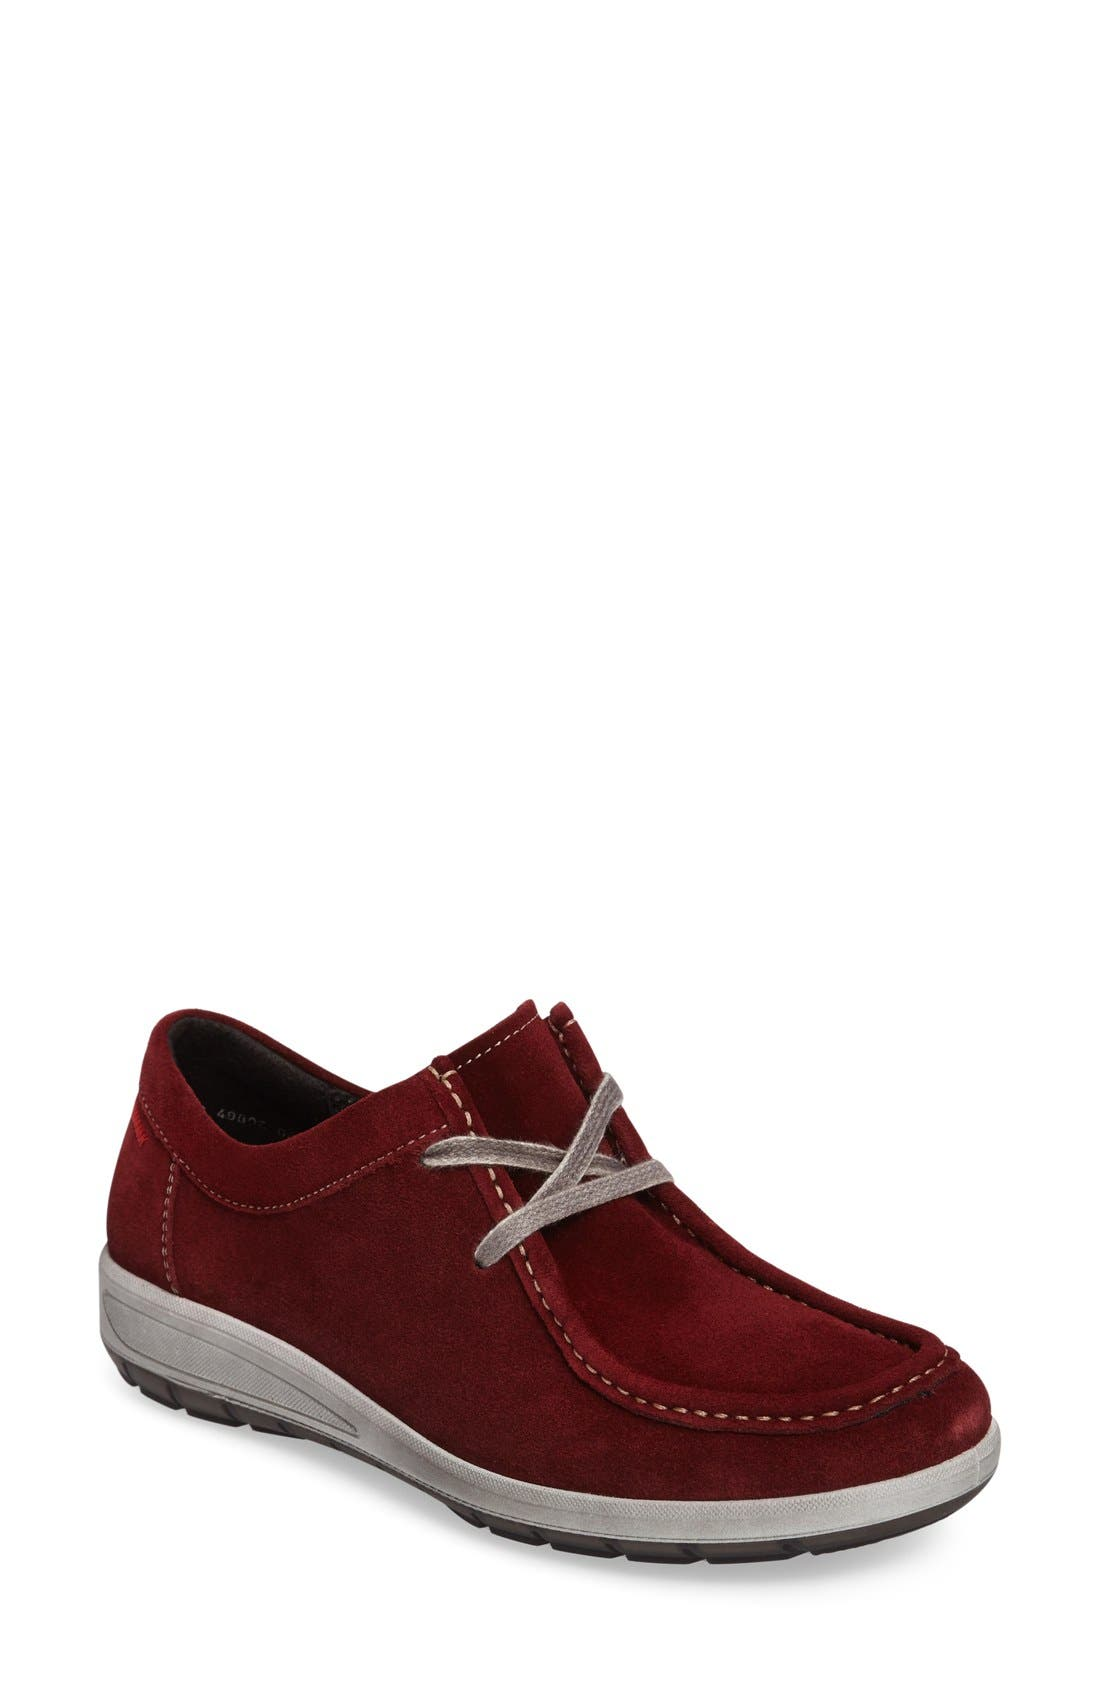 Trista Sneaker,                         Main,                         color, Burgundy Suede